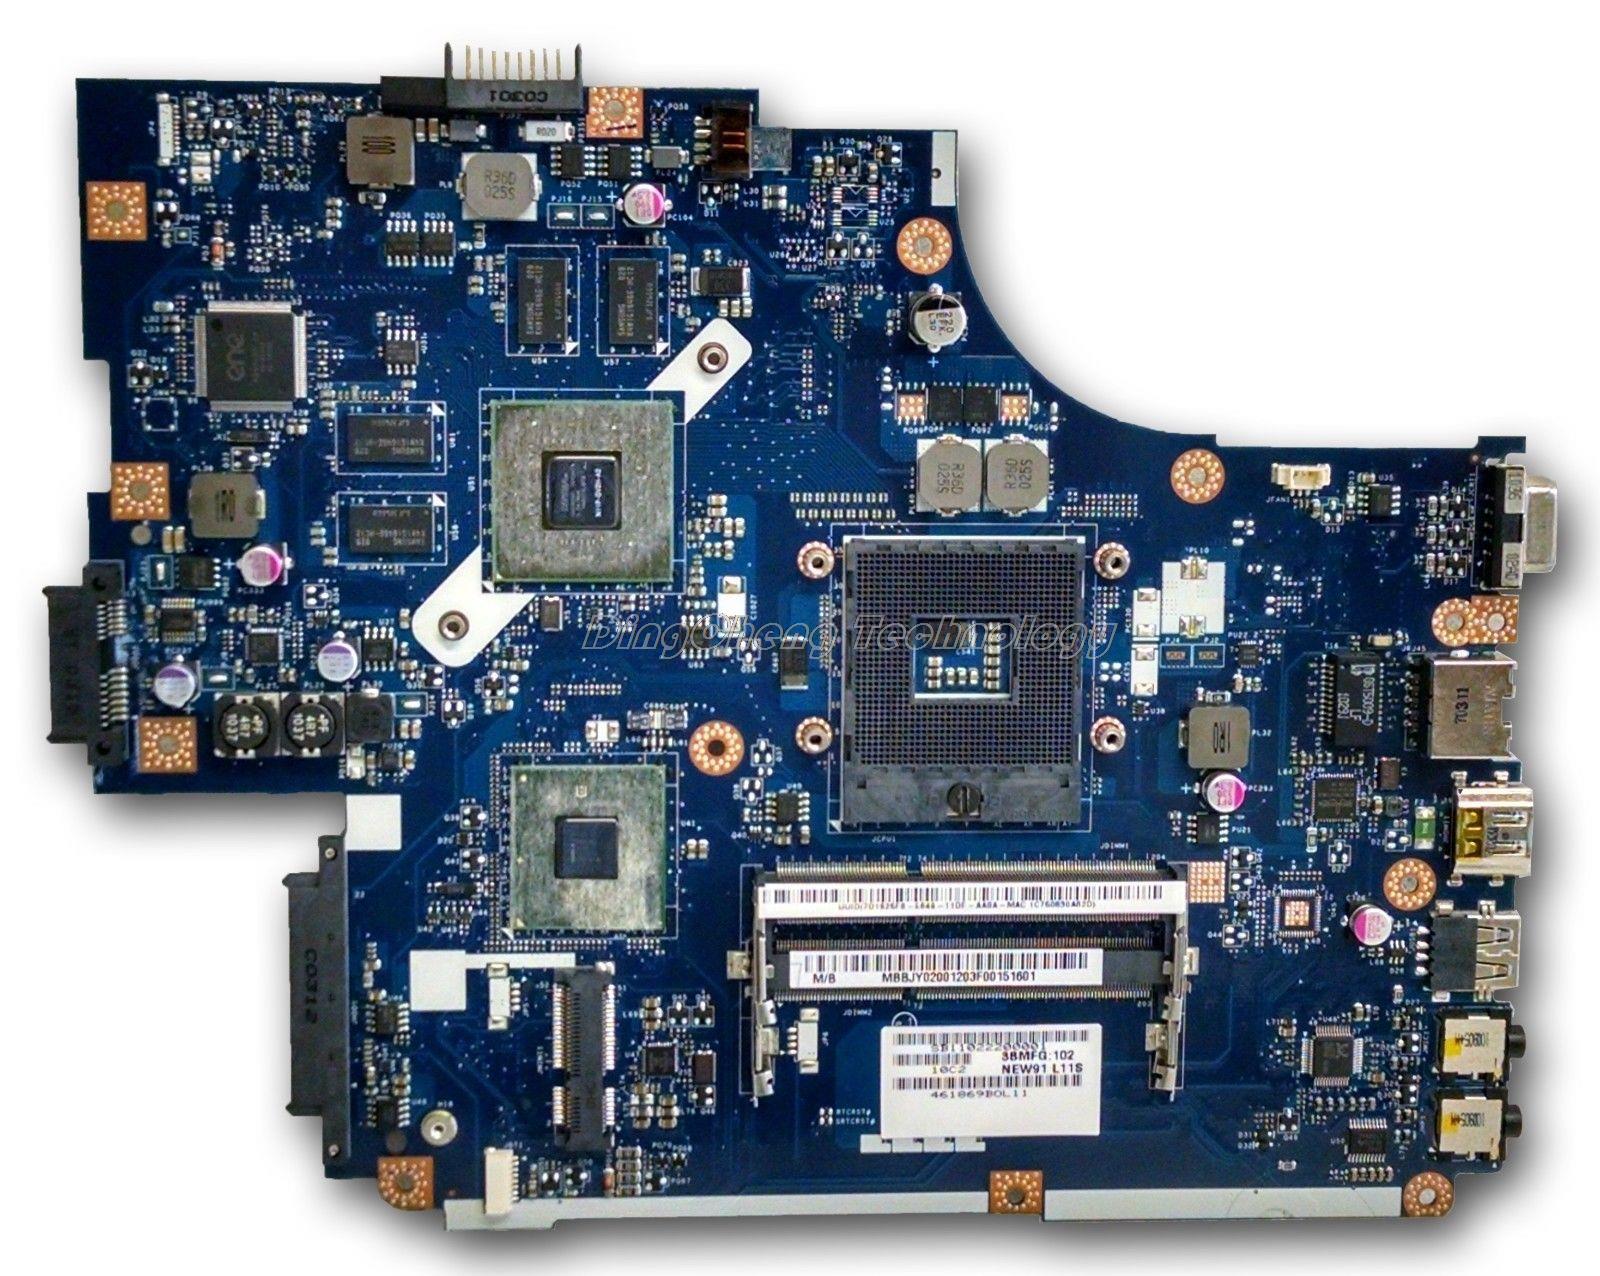 Подробнее о Original laptop Motherboard For Acer 5742 MB.BRB02.001 new71 LA-5893P Rev 1.0 non-integrated graphics card 100% fully tested for acer 5742 la 6582p laptop motherboard mbrjw02001 100